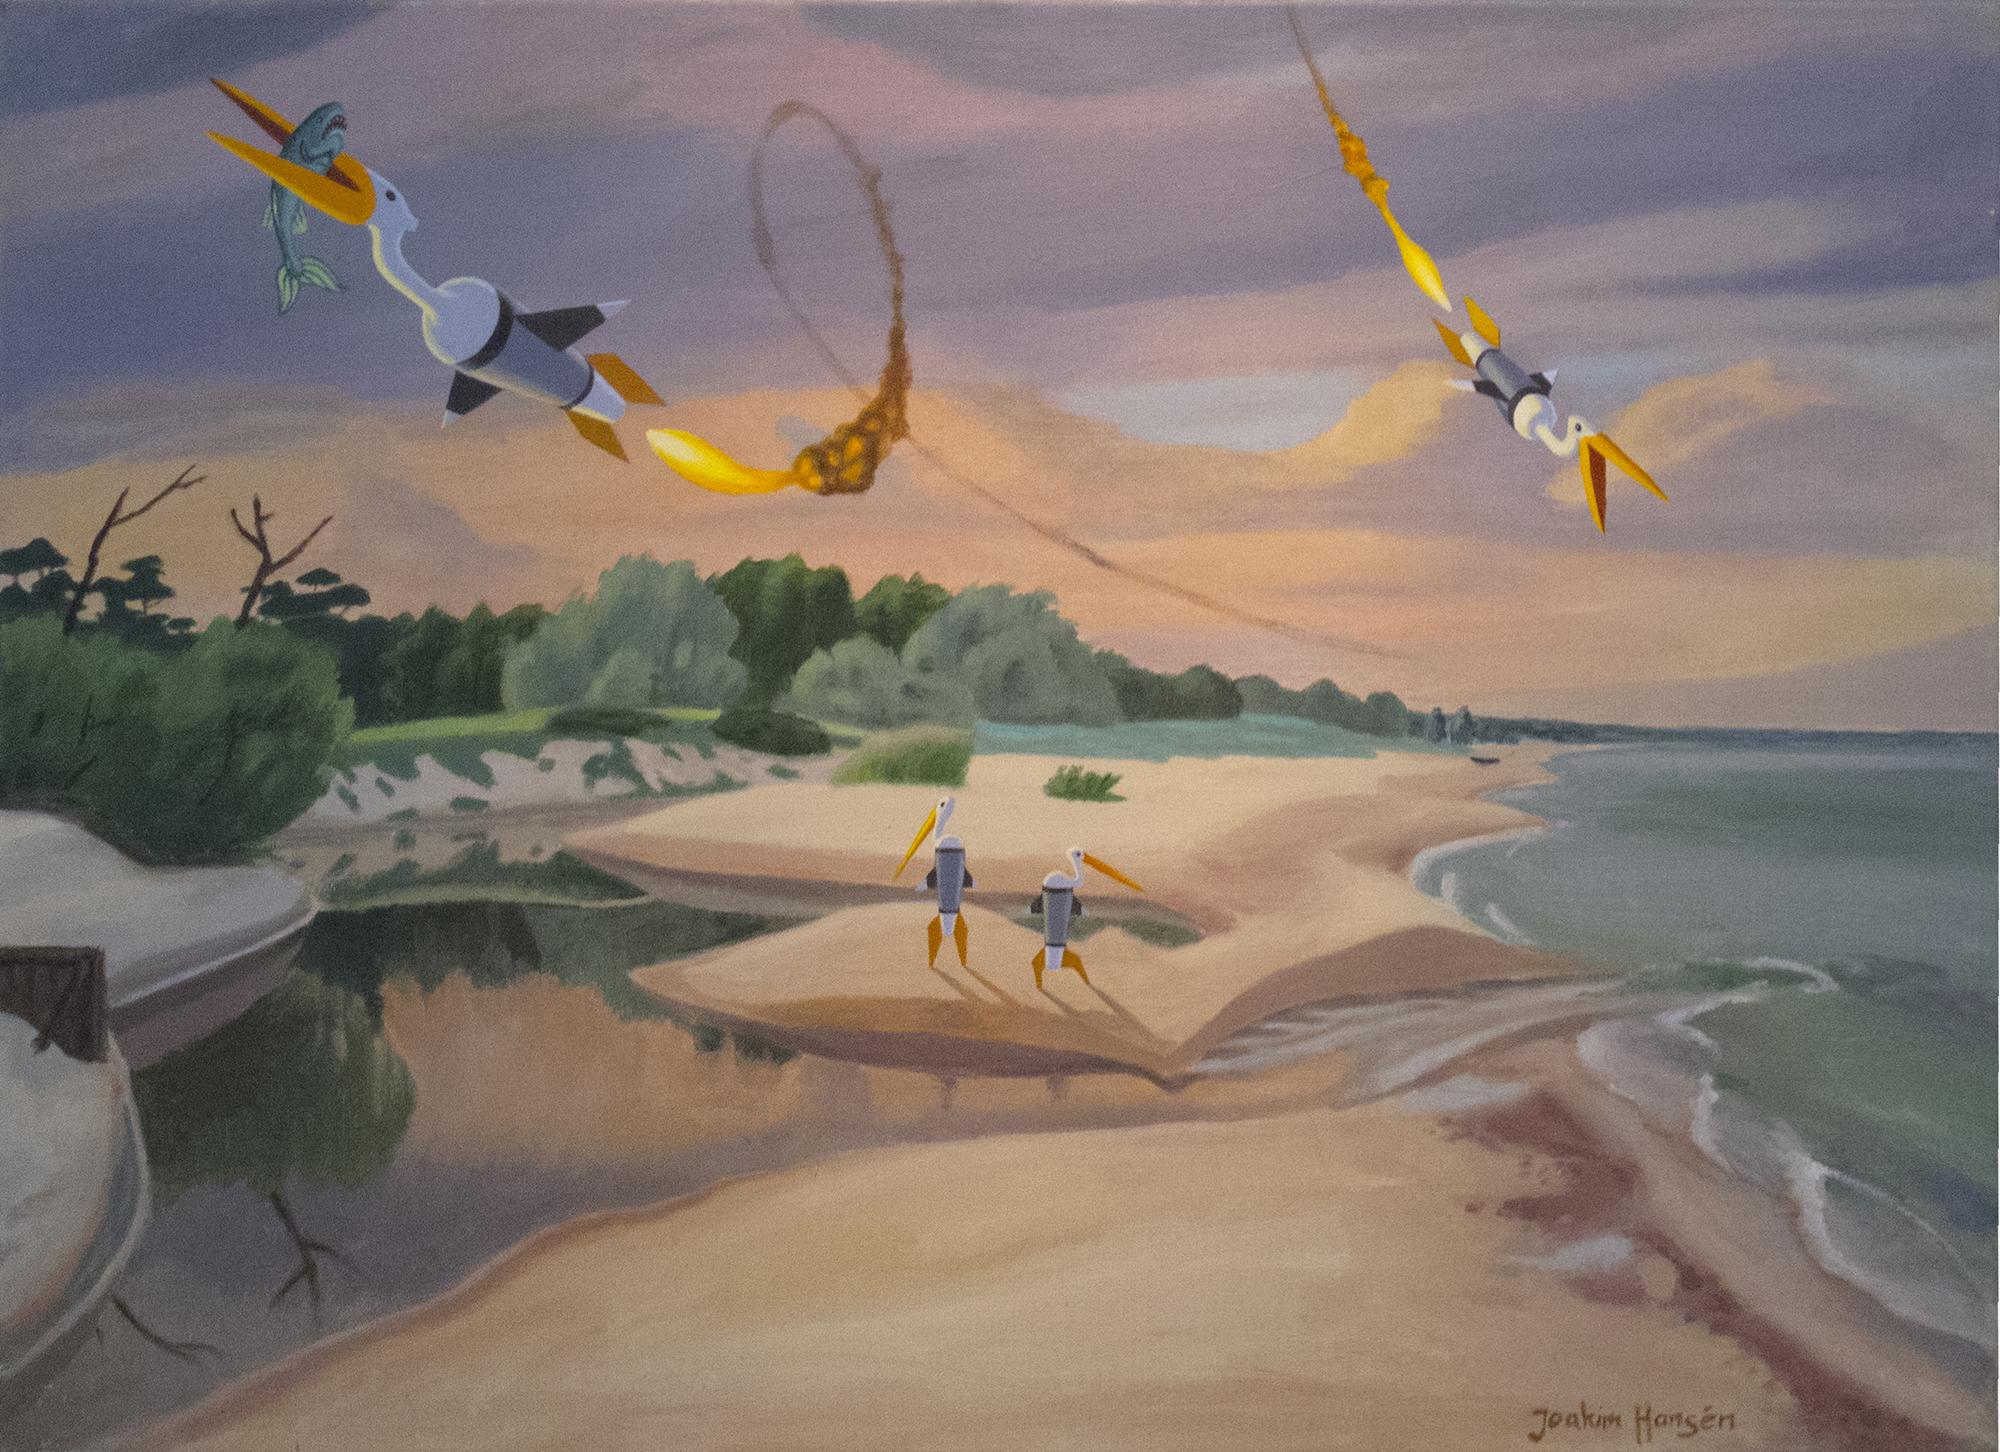 birds_over_the_creek_of_juleboda_joakim_hansen